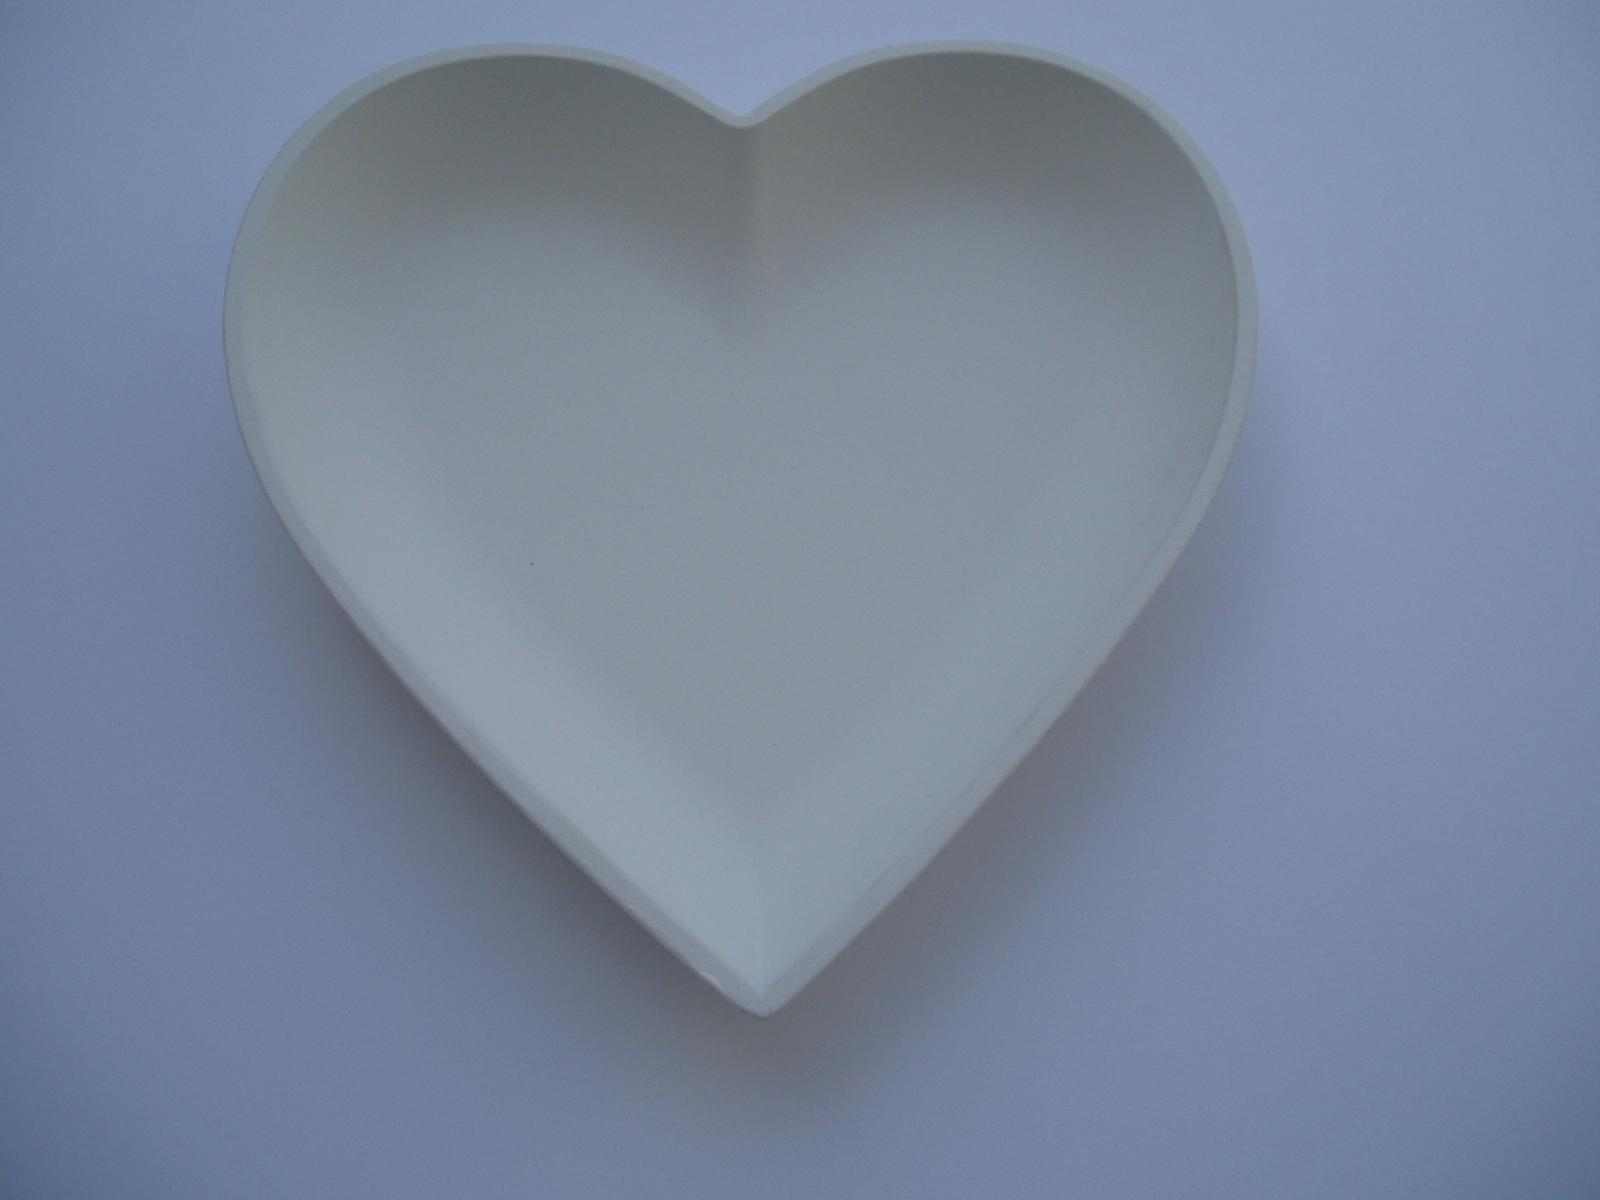 bílé srdíčko-miska - Obrázek č. 1